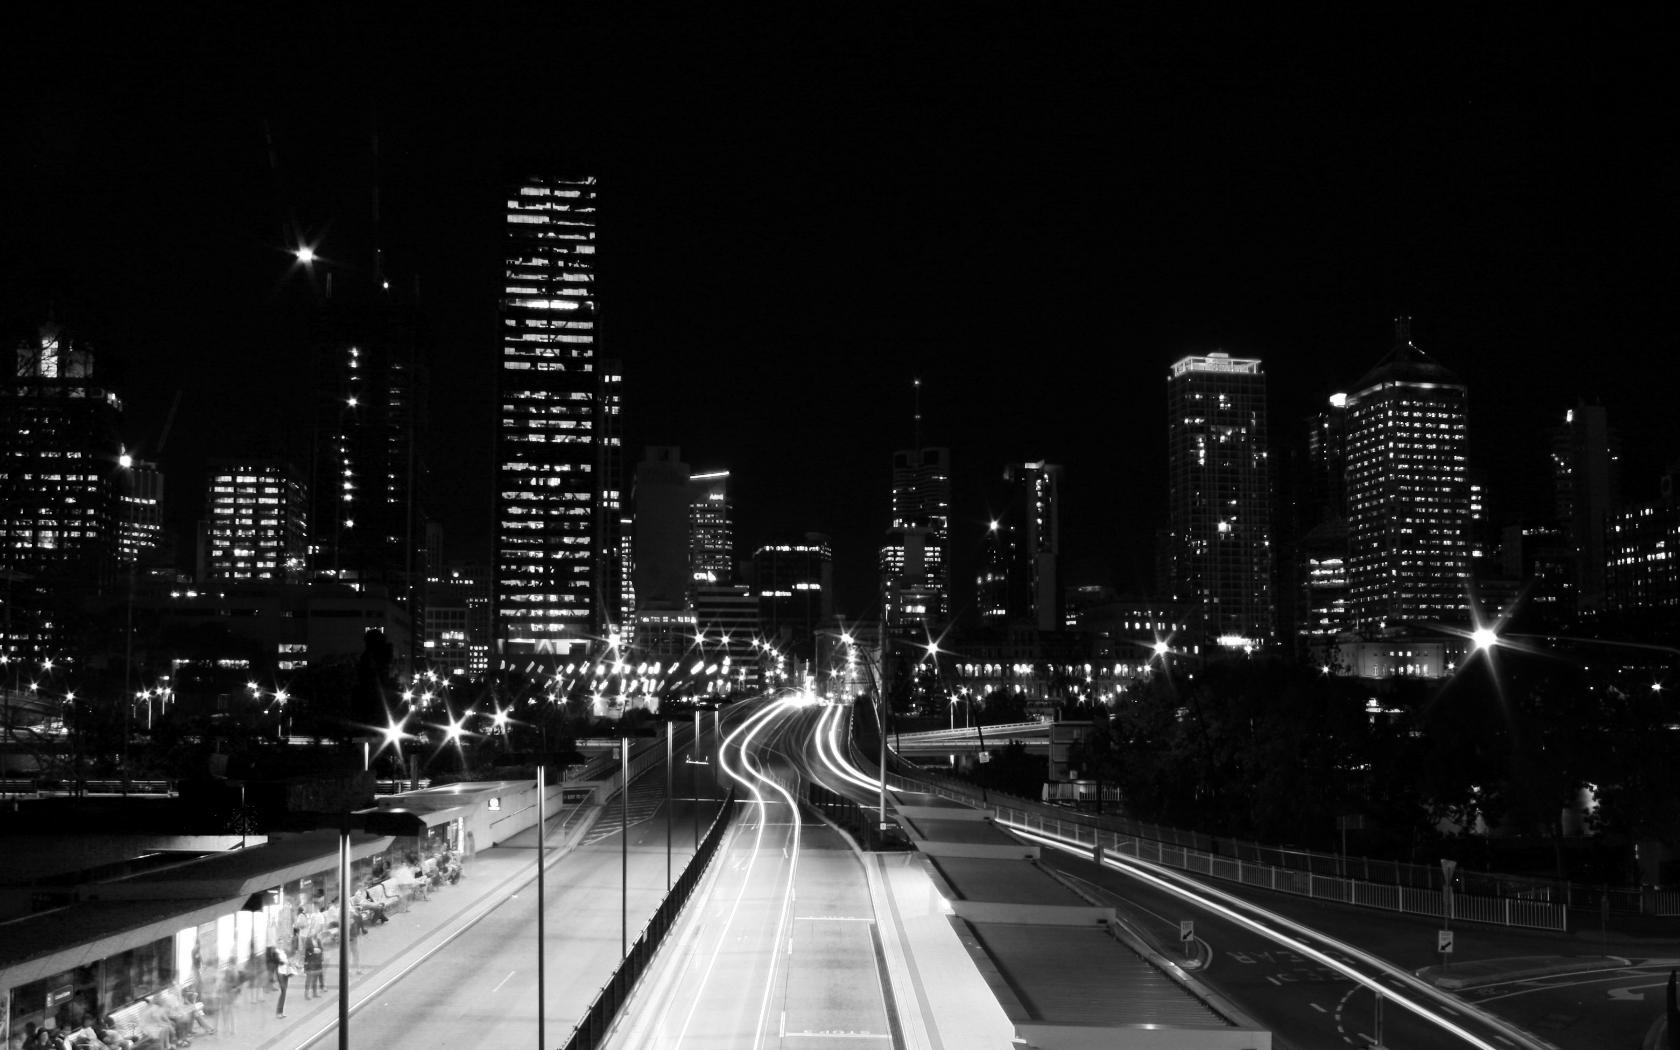 City HD Wallpaper Images For Desktop Download 1680x1050